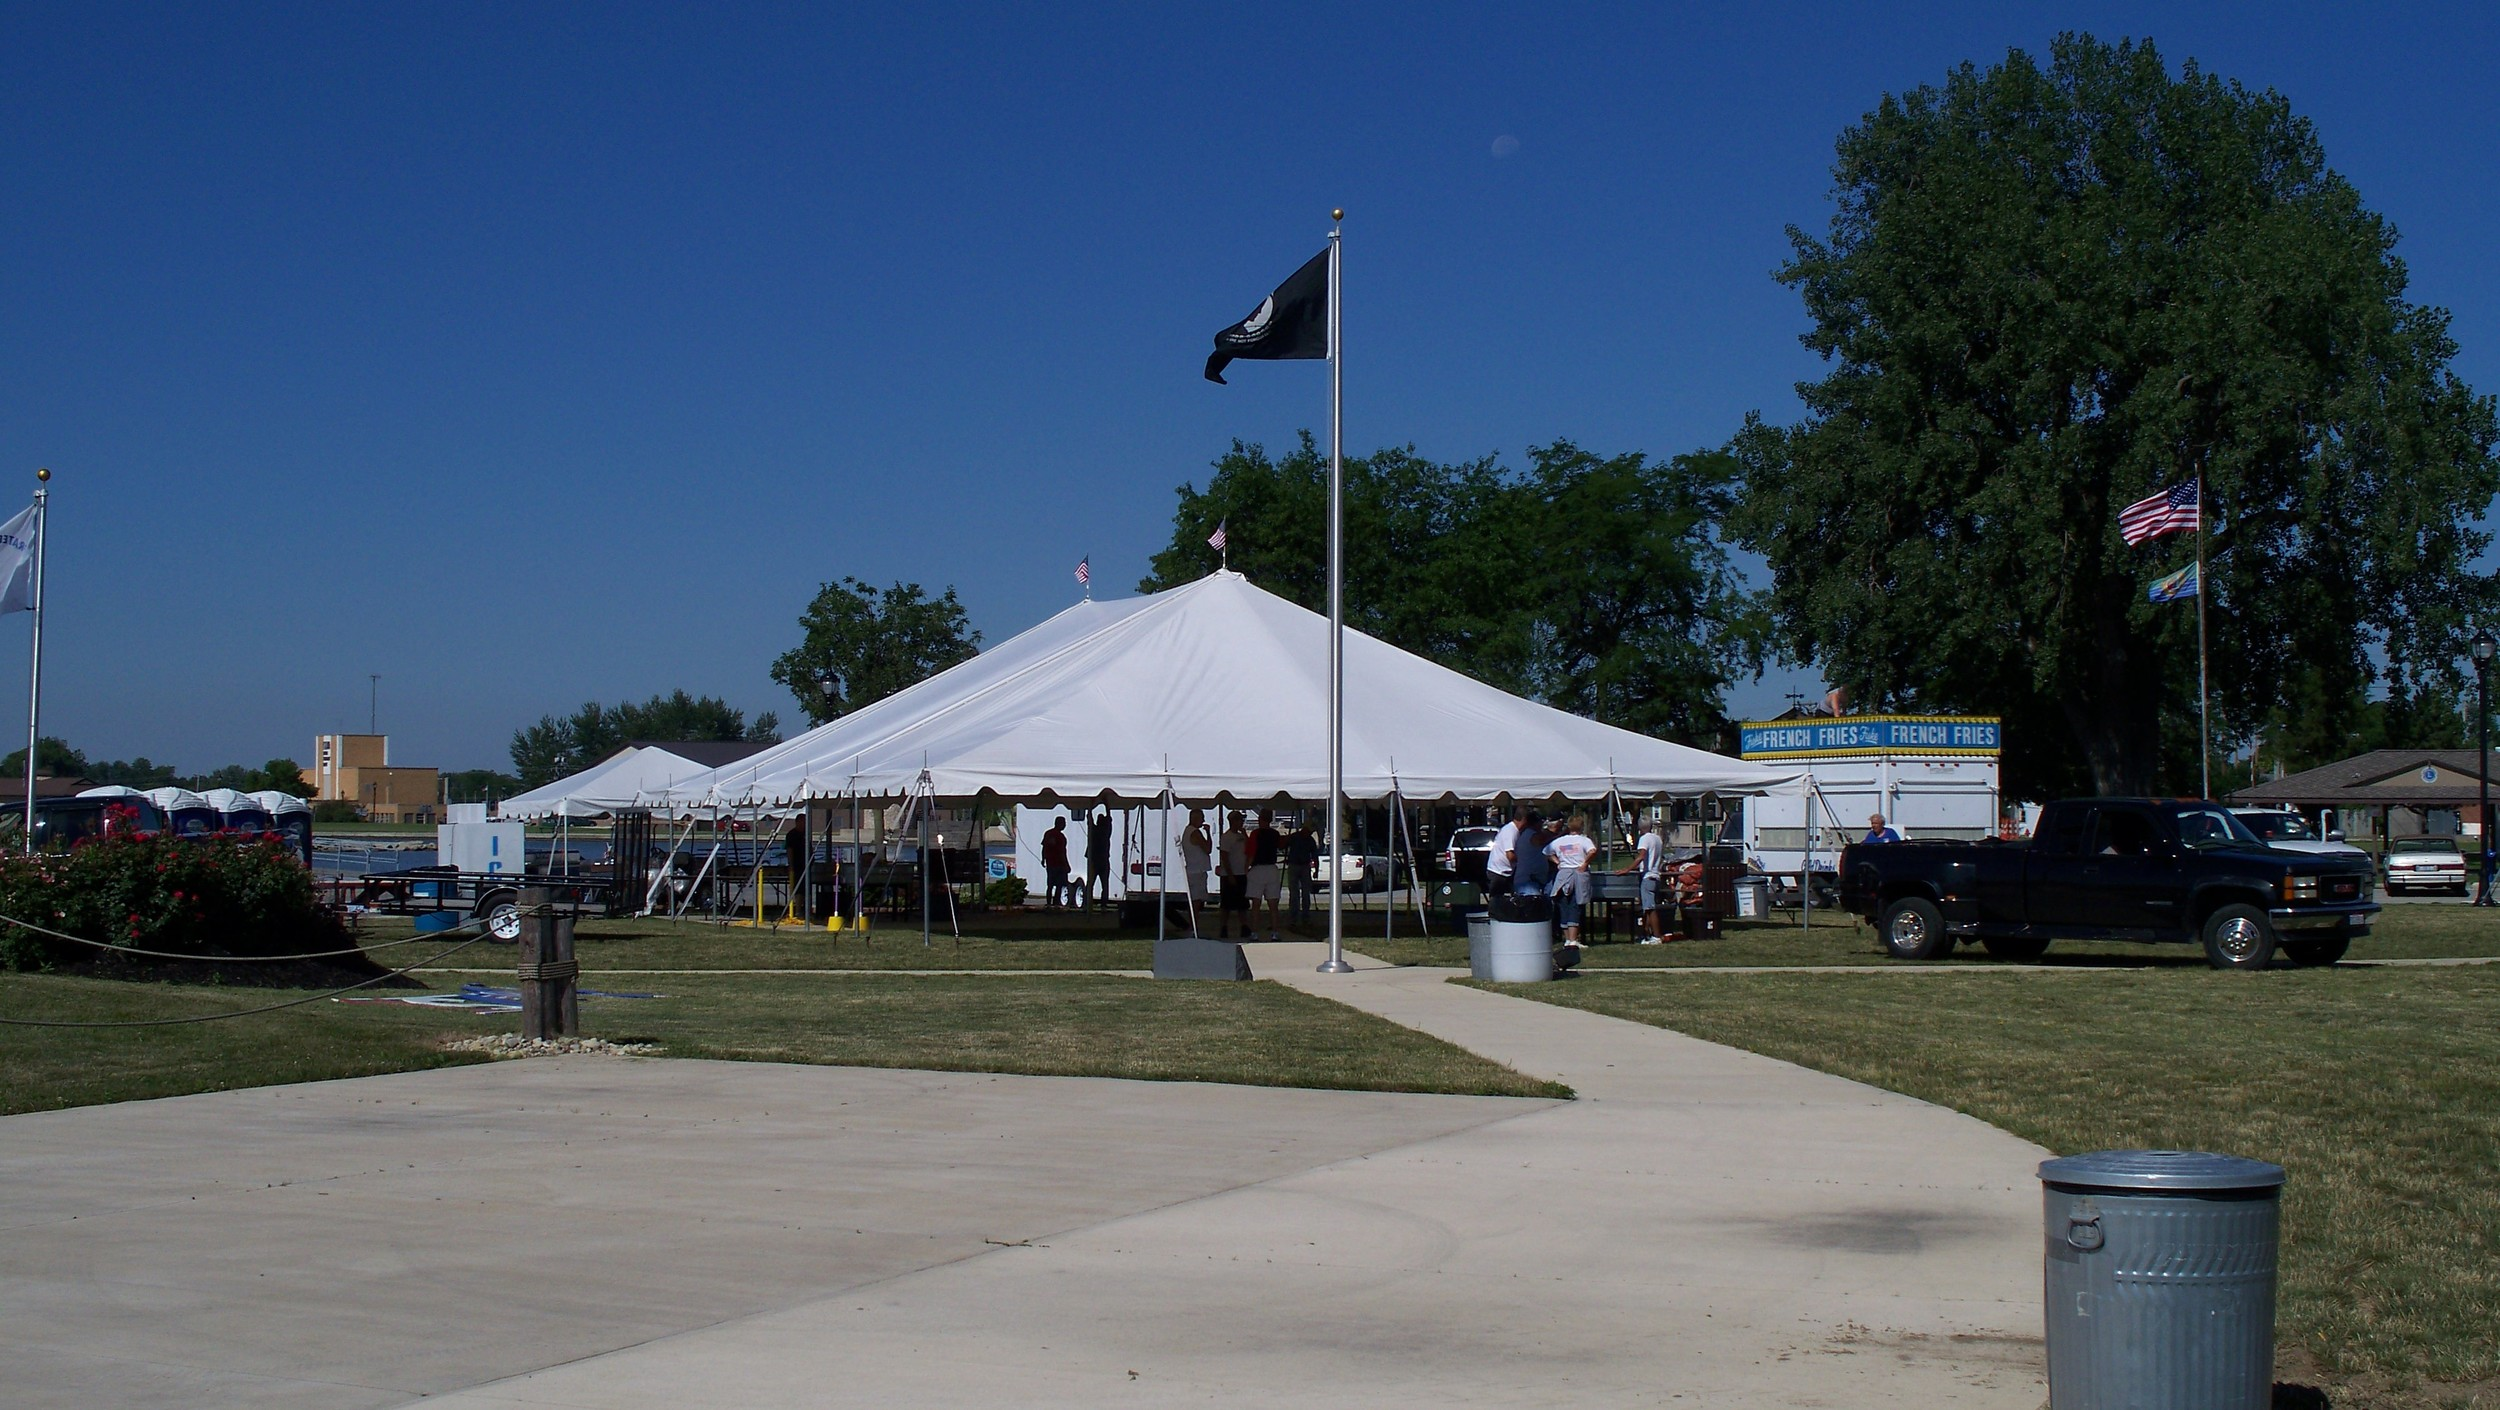 40' x 60' 3pc Pole Tent Freedom Days 2010 Tents- 016.jpg